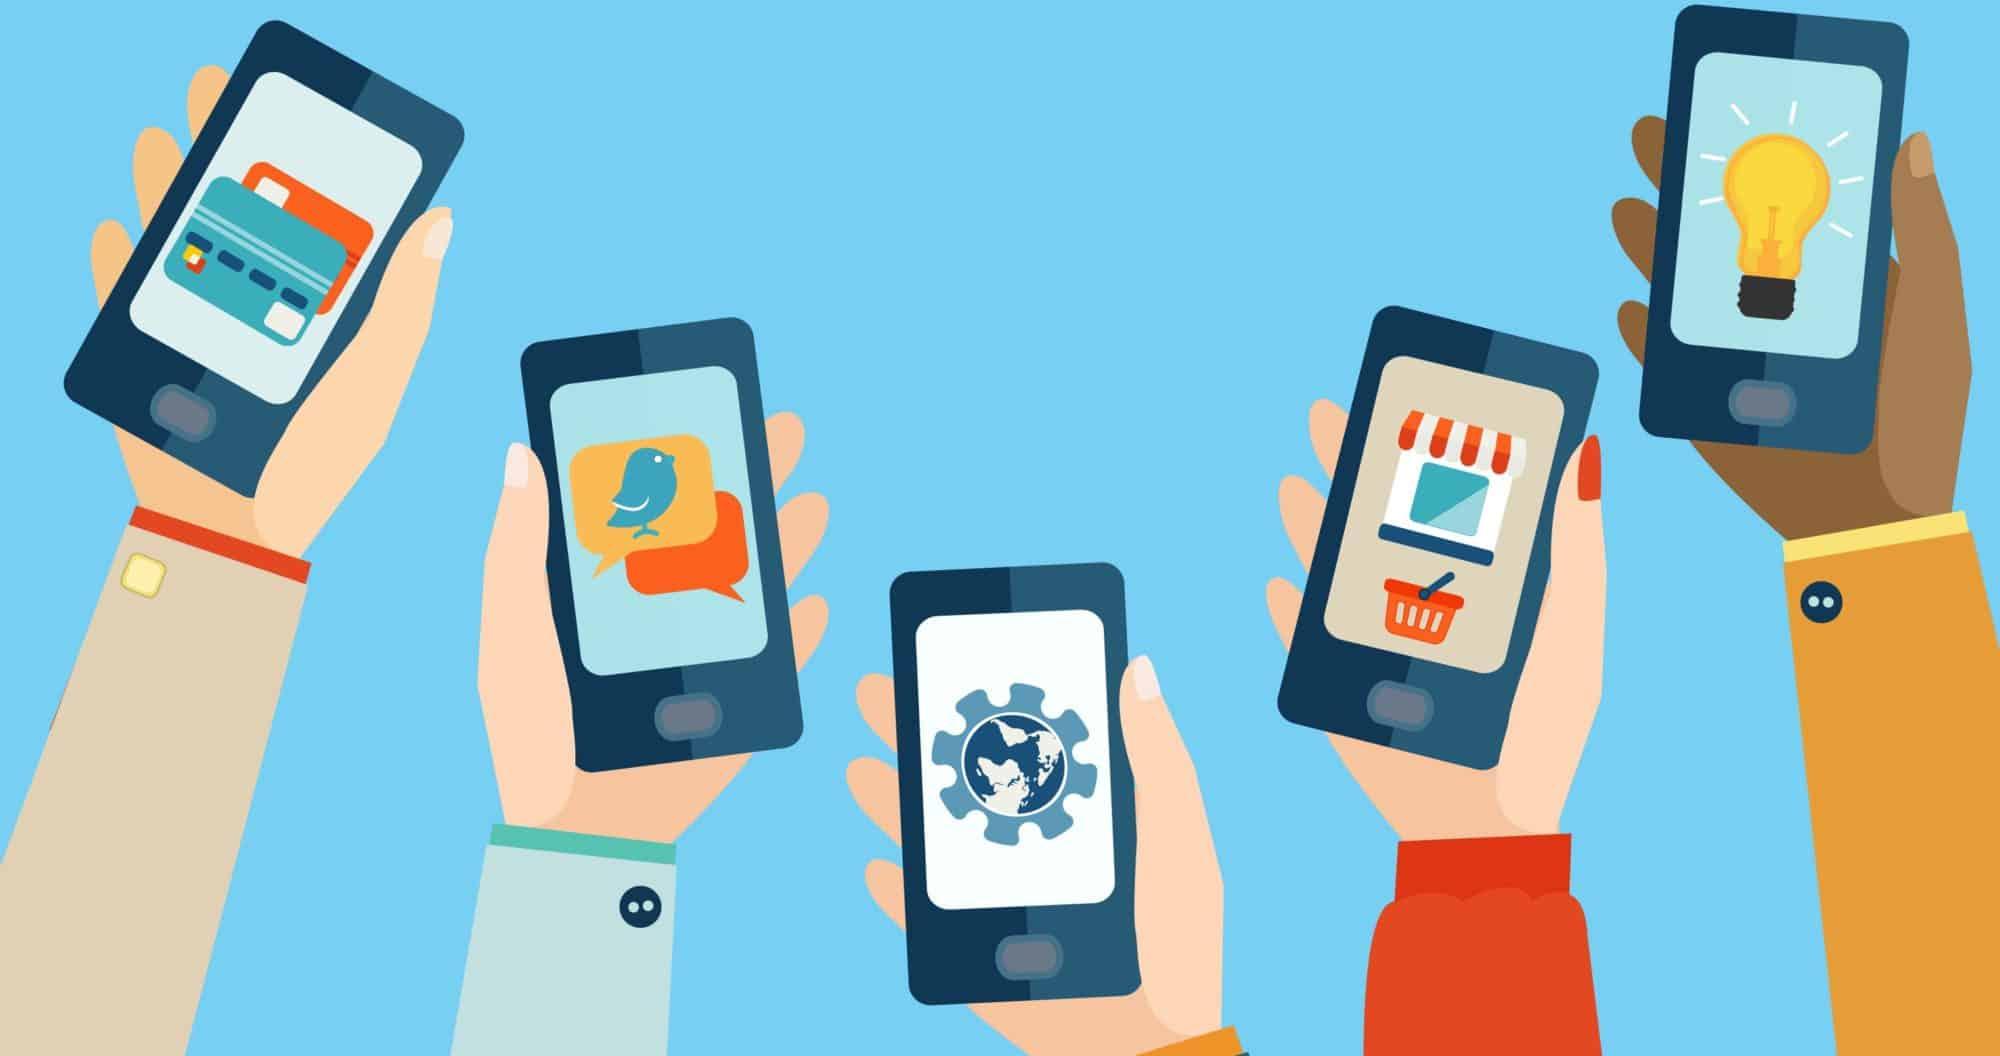 smm, аудитория, бизнес, бренды, интернет-маркетинг, контент, продвижение, соцсети, стратегия